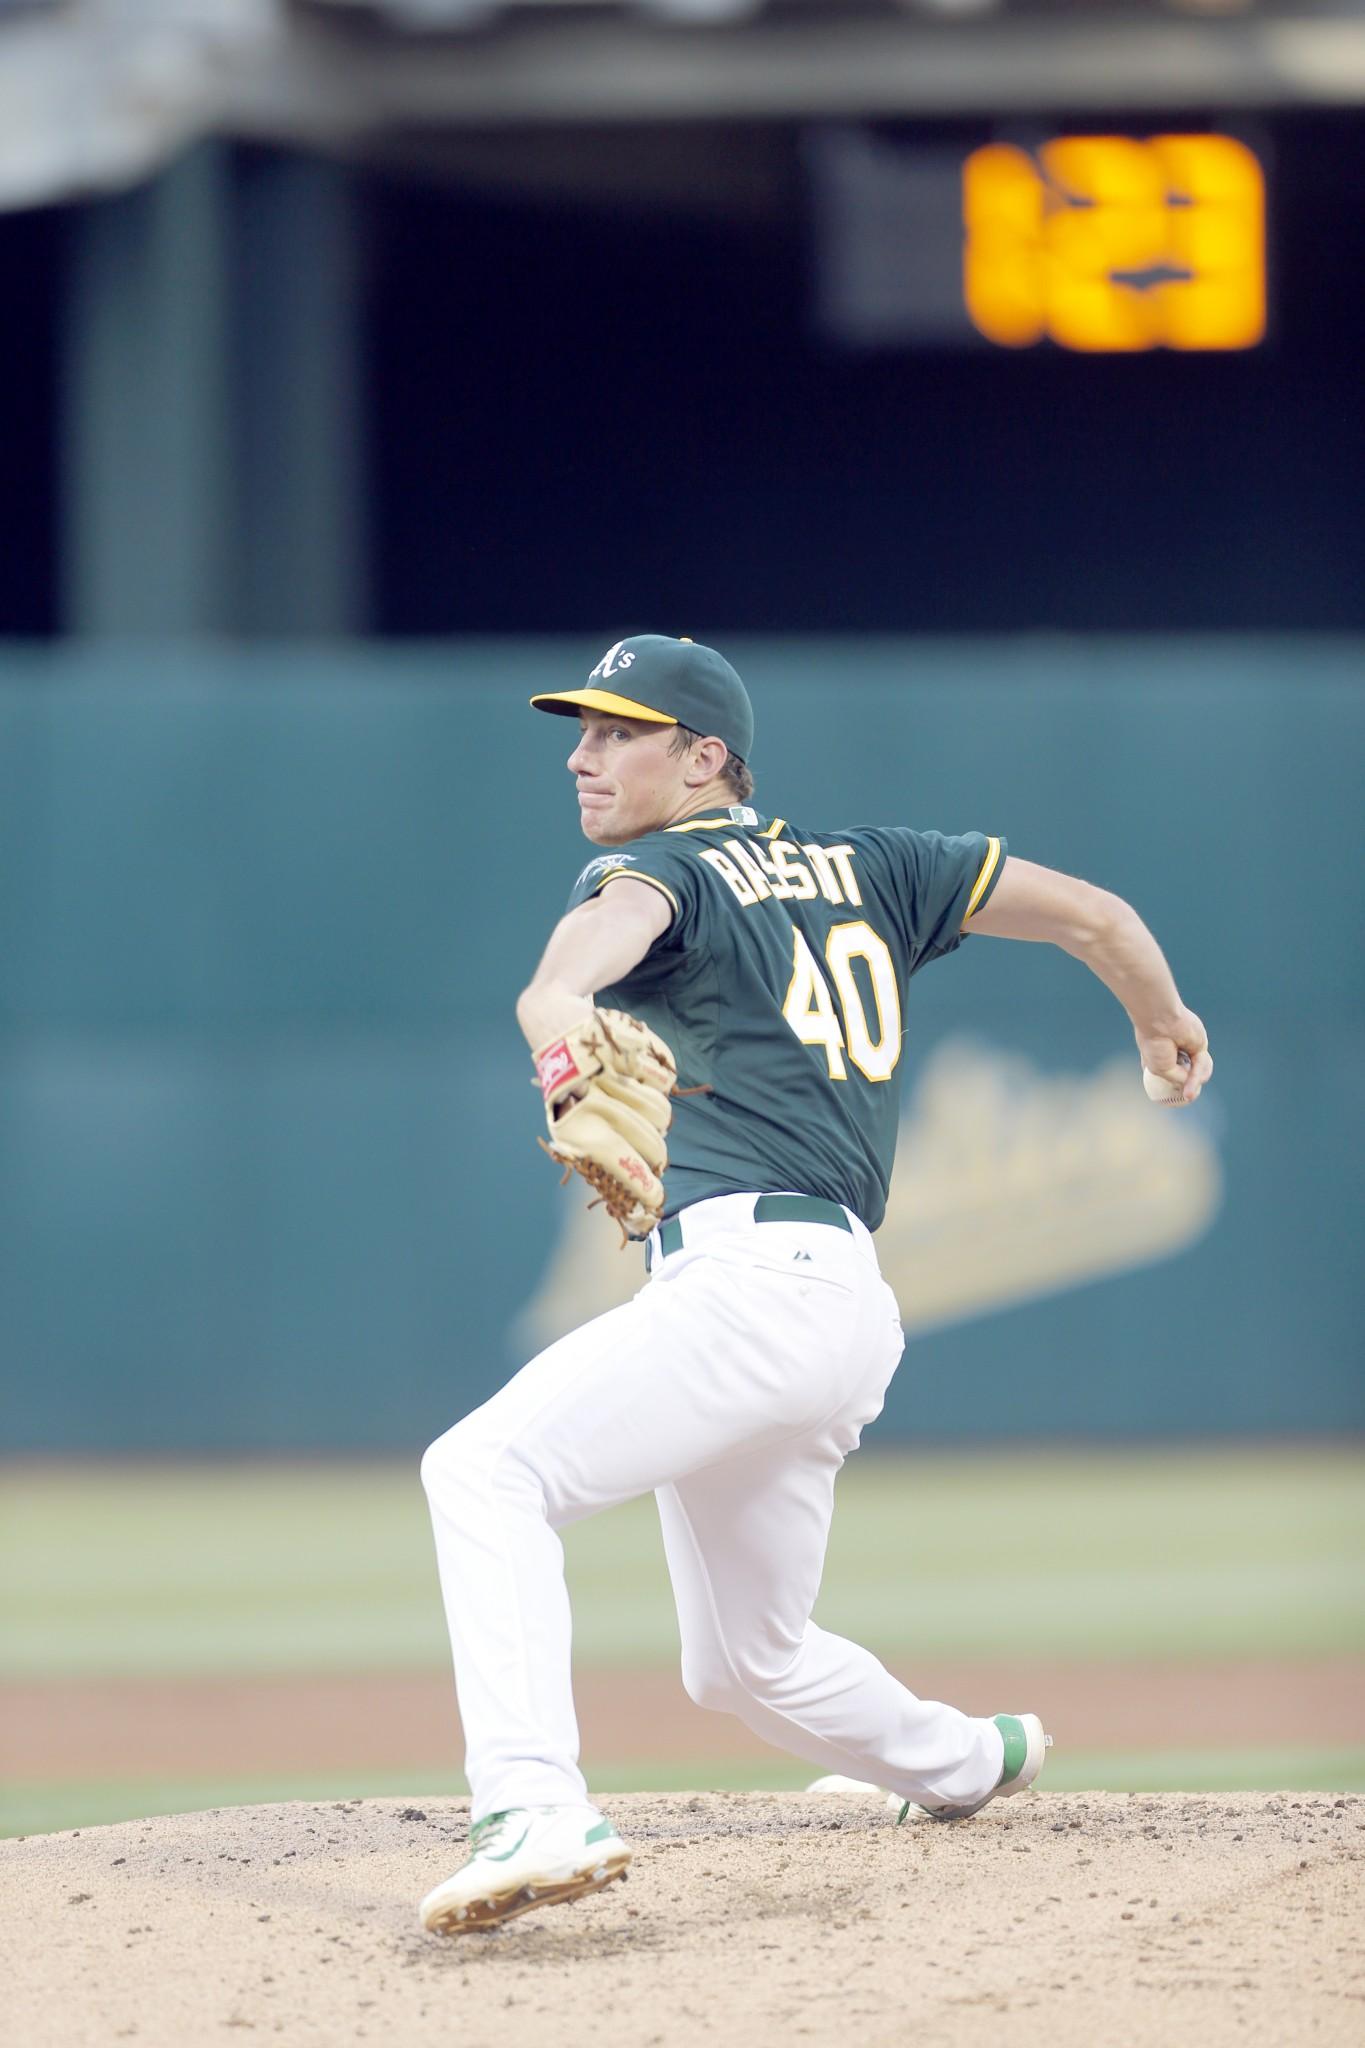 Oakland Athletics pitcher Chris Bassitt (Genoa/University of Akron). (Photo courtesy Oakland Athletics)